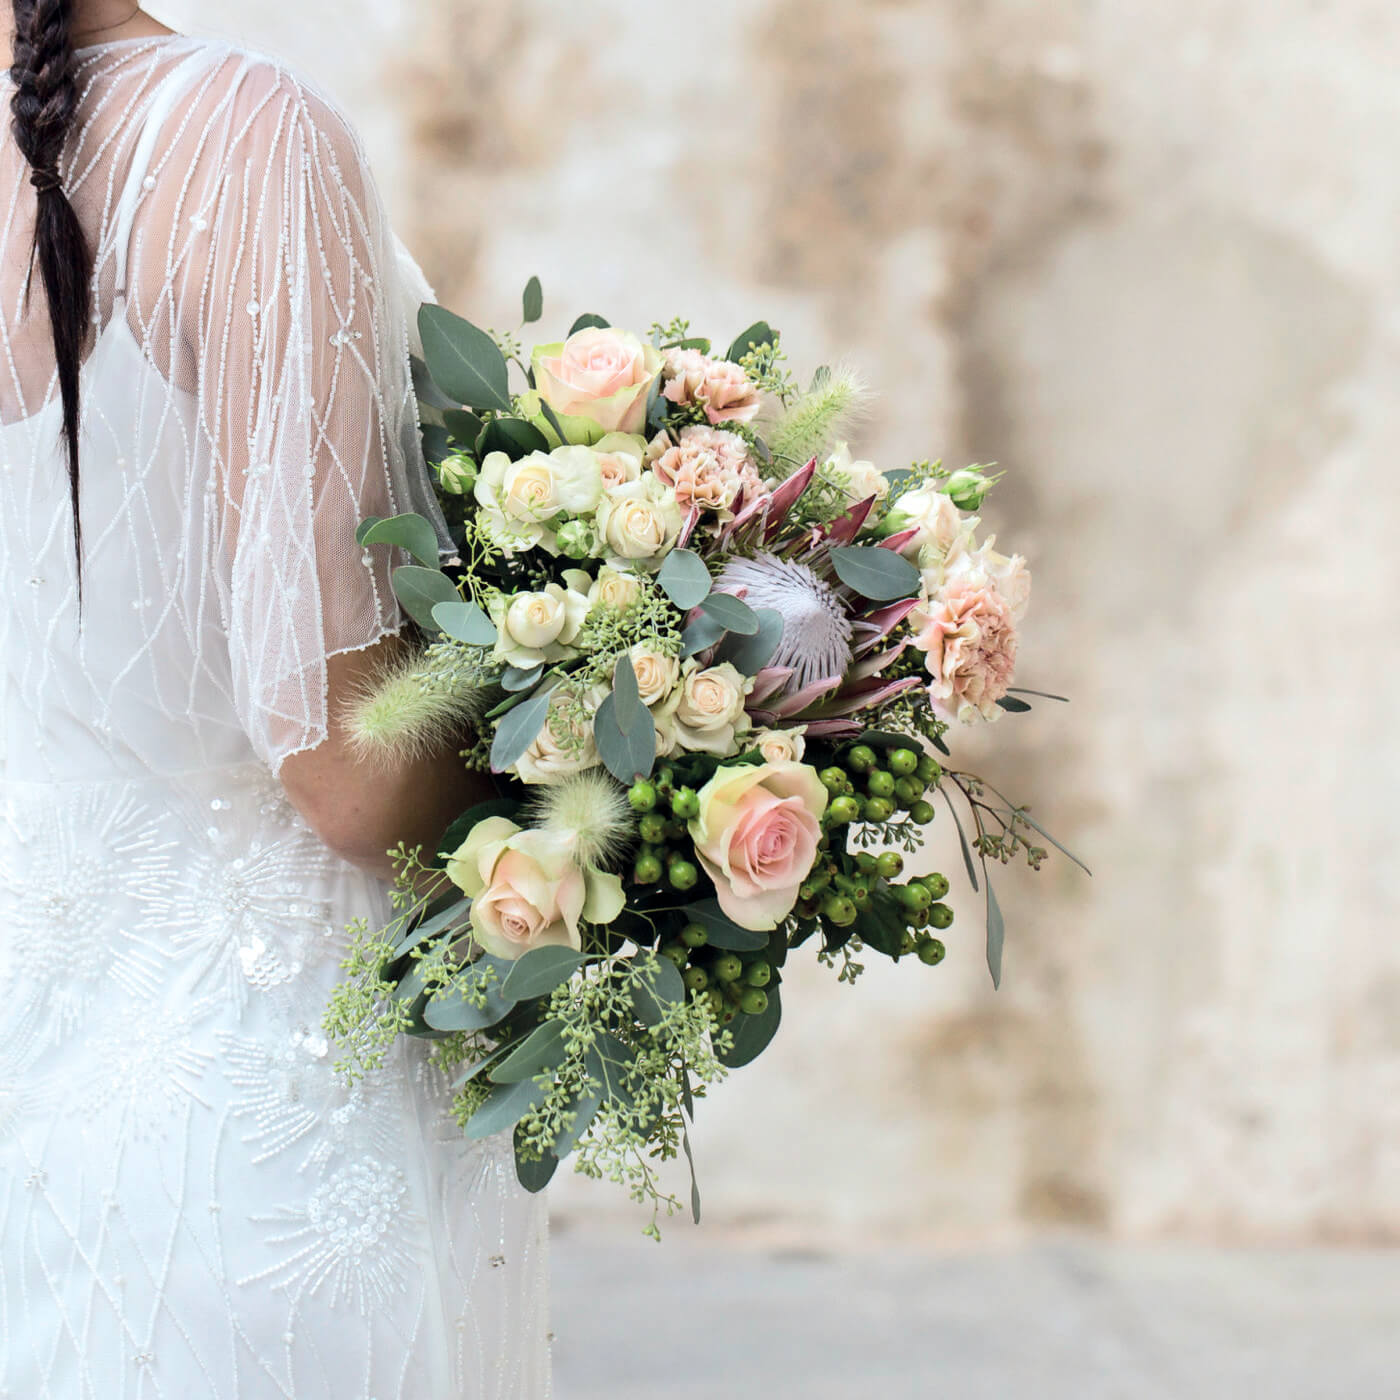 Wonderful Find den perfekte brudebuket - Bryllup AC-72